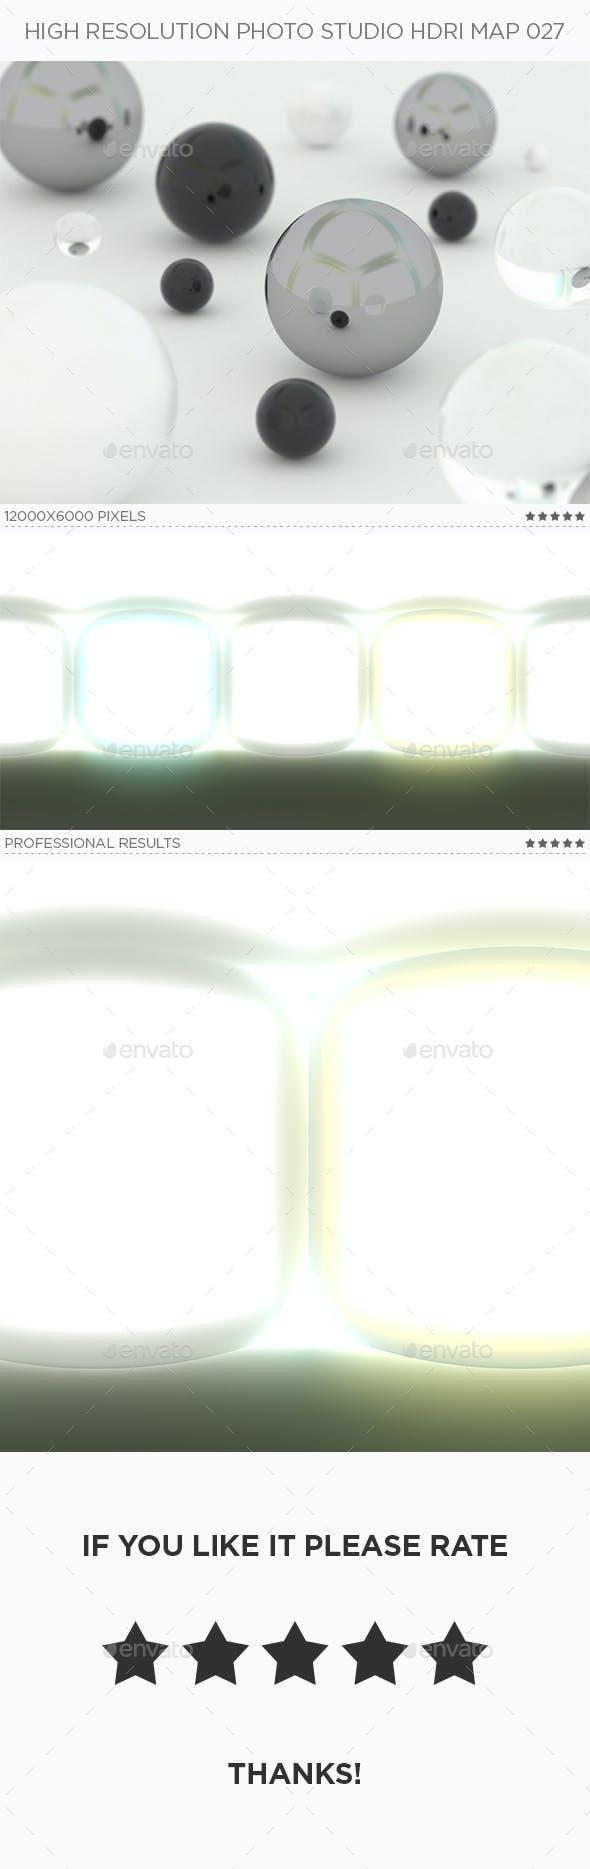 High Resolution Photo Studio HDRi Map 027 - 3DOcean Item for Sale